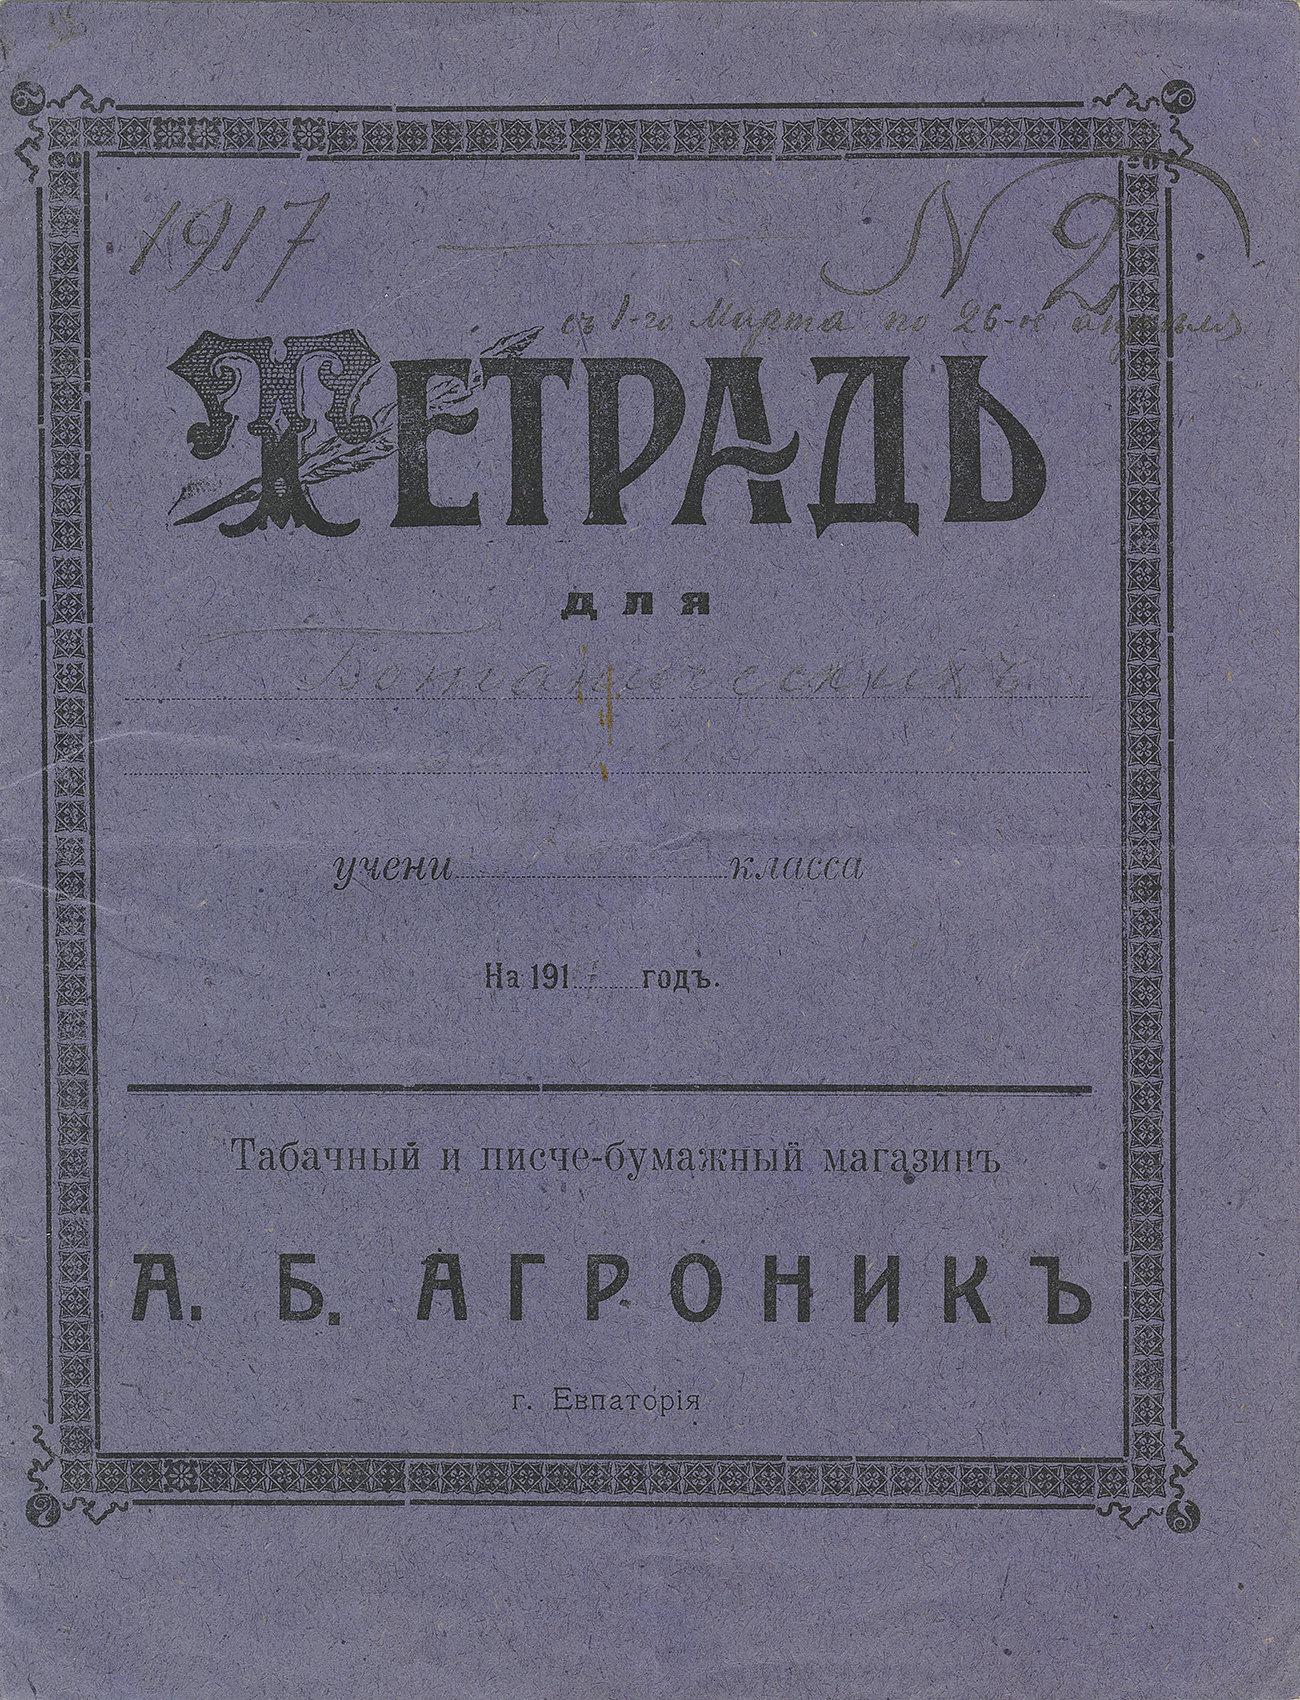 Тетрадь Евпатория, 1917, 170х225